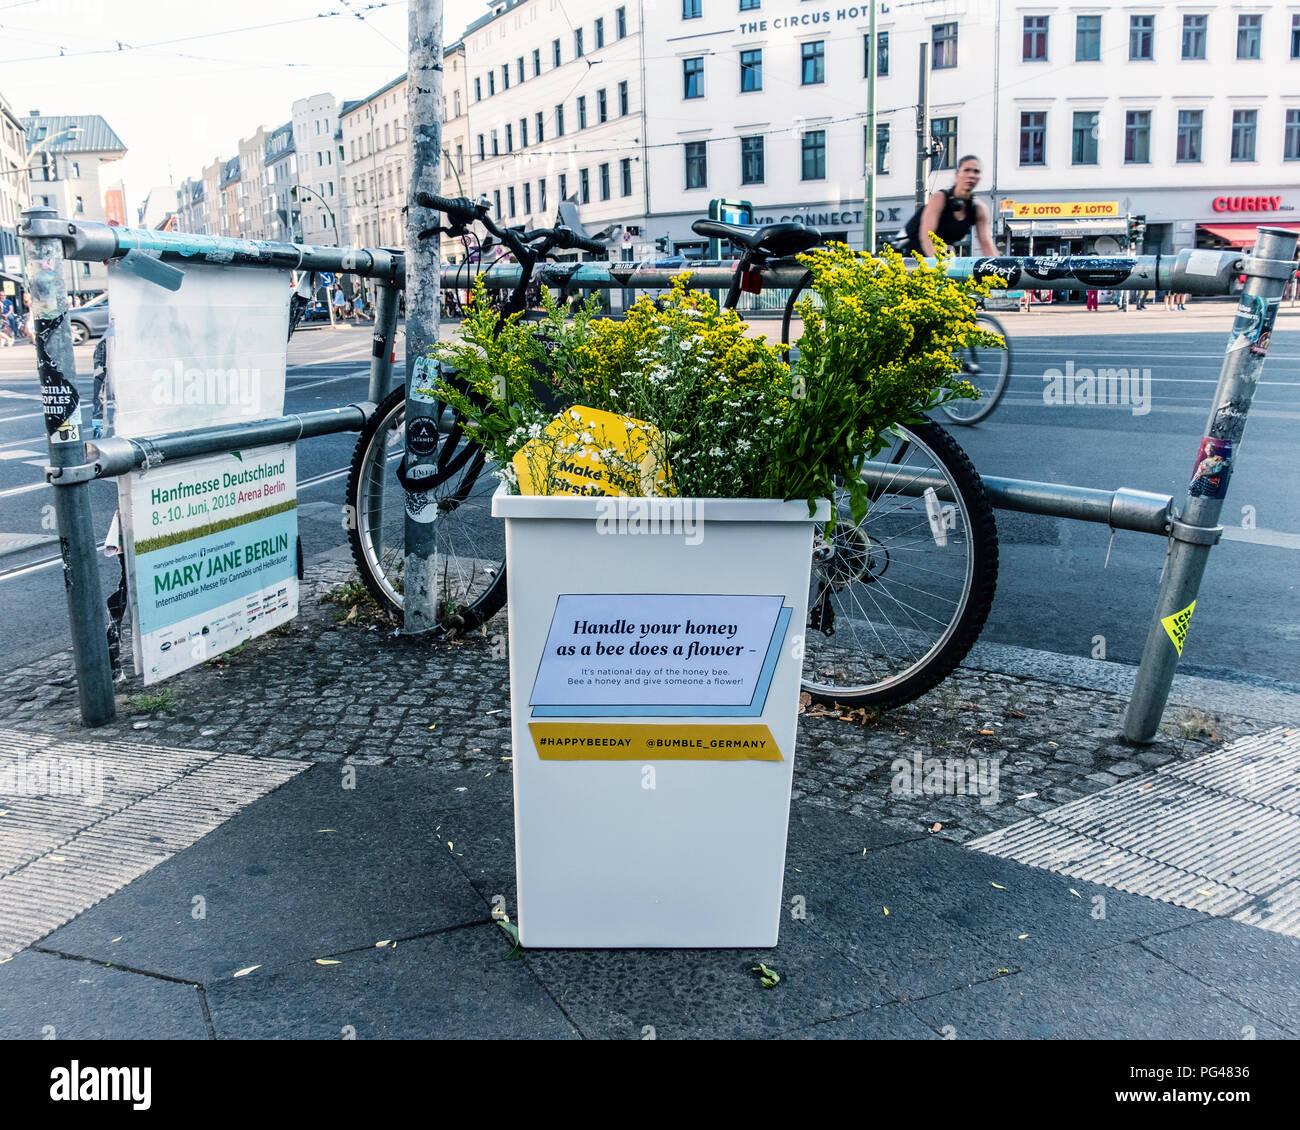 Berlin-Mitte, Rosenthalerplatz. Container of flowers on street corner on National Honey Bee day raises awareness for bee industry - Stock Image